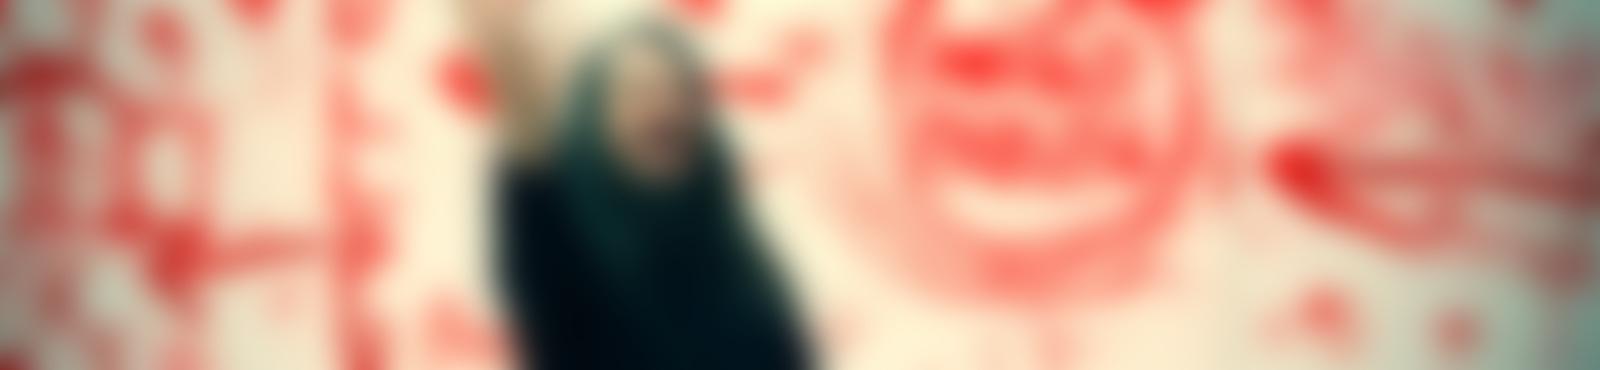 Blurred 076201cb bf0f 4c90 8e9c a3133c86aa0f